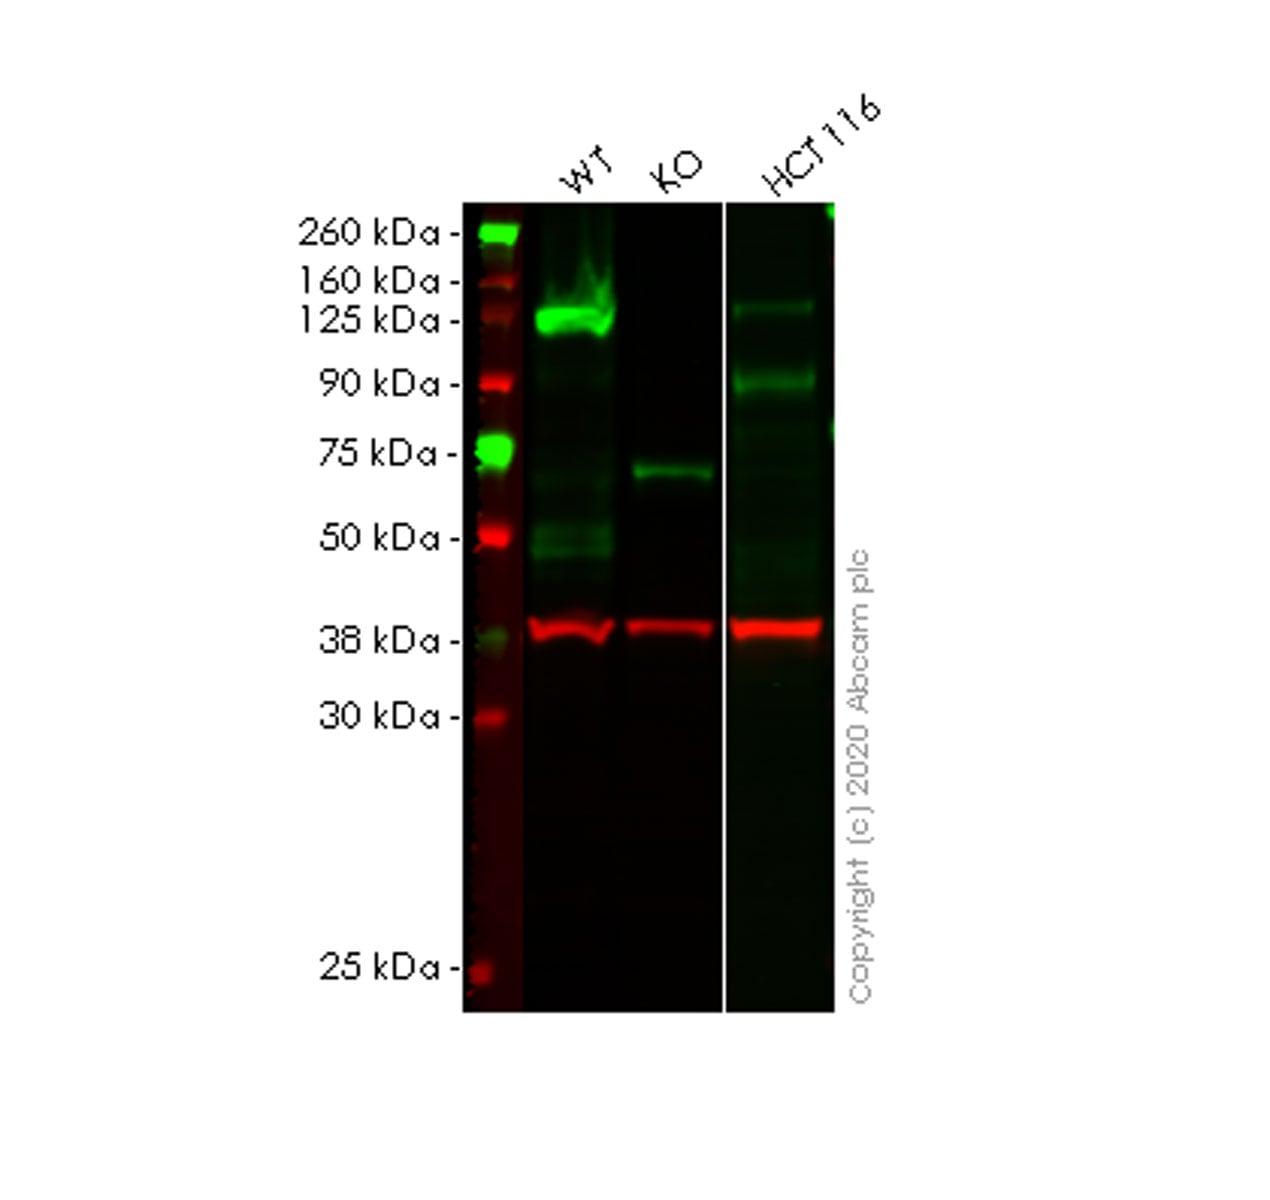 Western blot - Anti-TACC3 antibody [EPR7756] (ab134154)